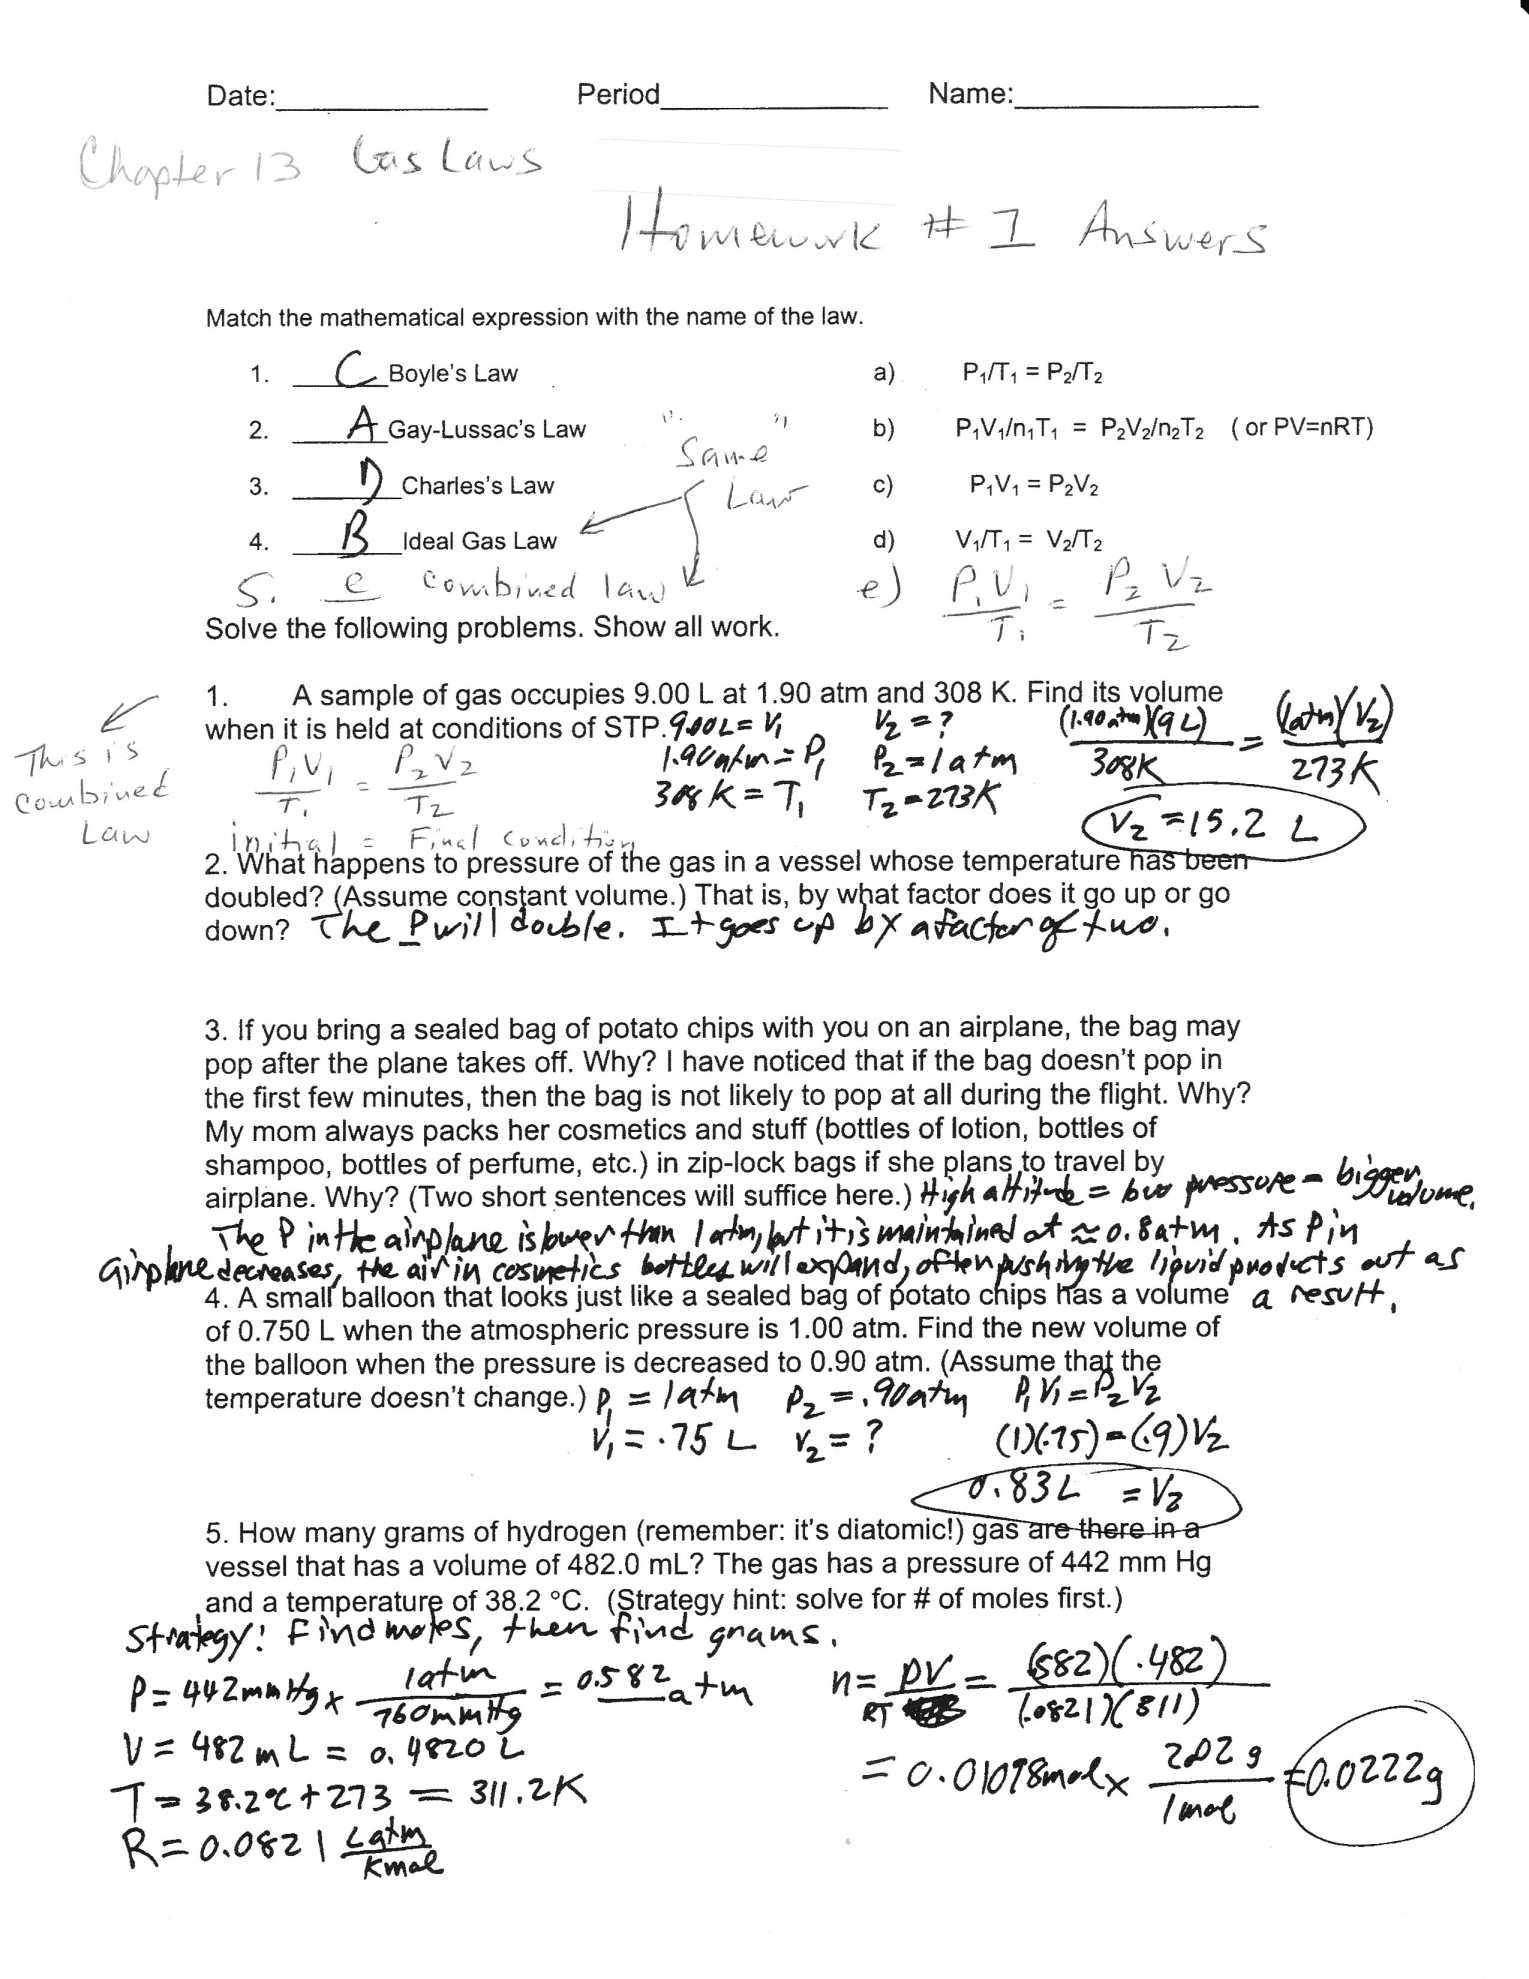 Gas Laws Worksheet 1 Answer Key